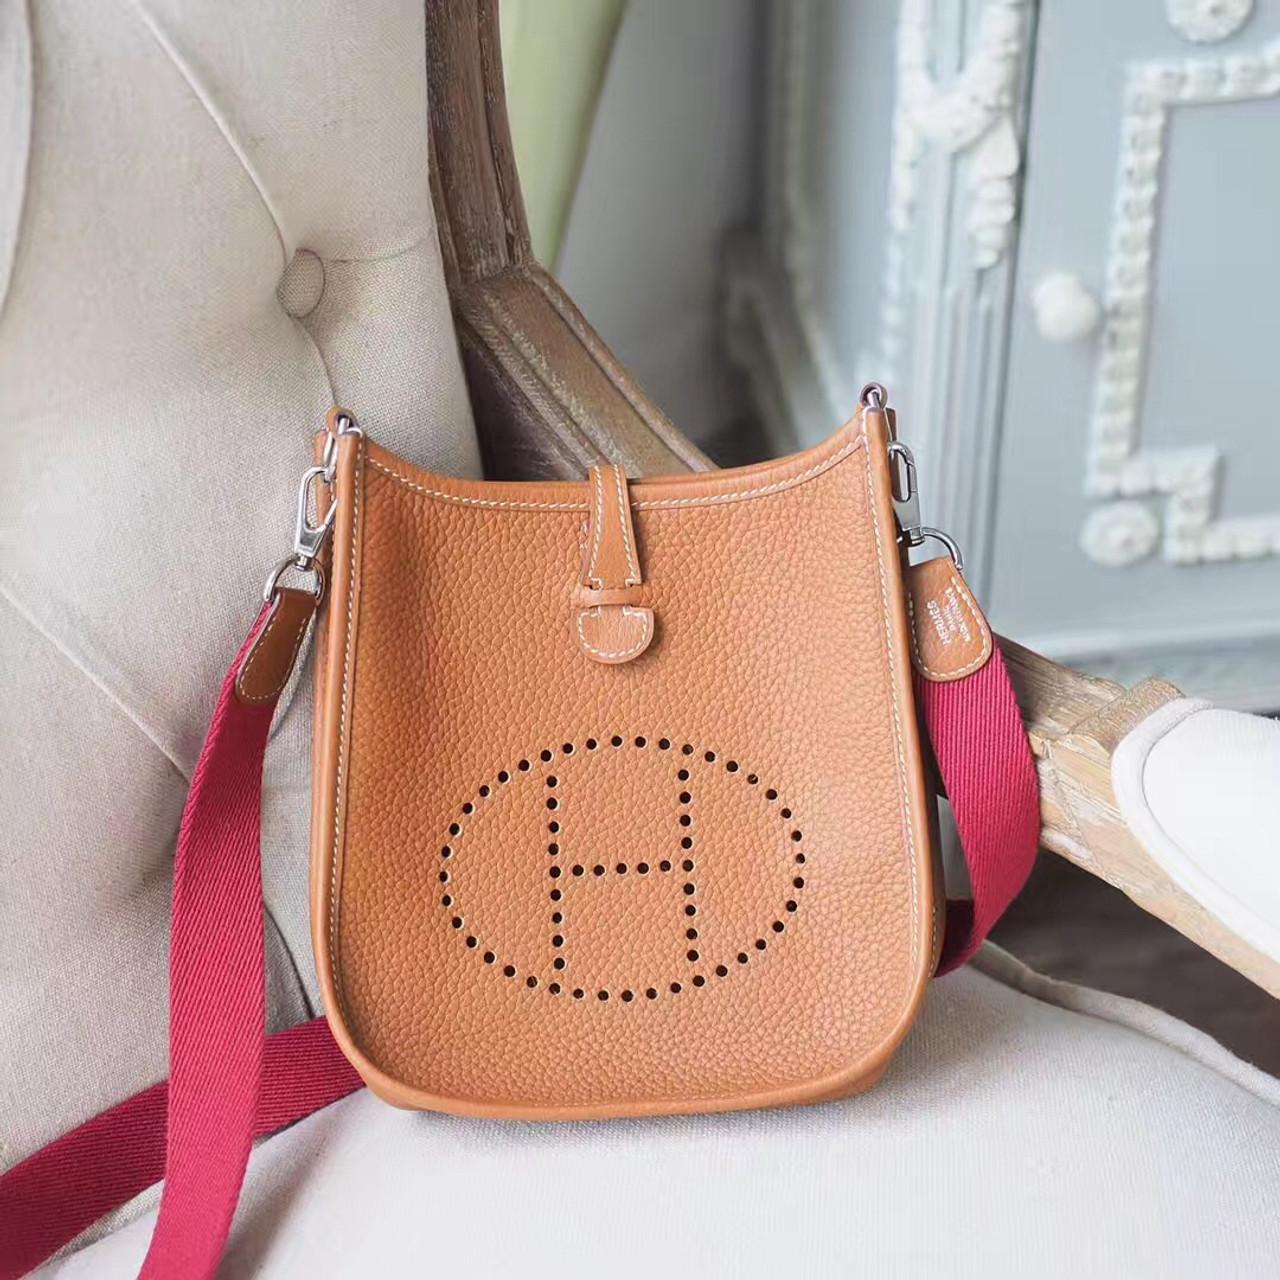 f6e45c2a176d Hermes Evelyne TPM 16cm Bag Taurillon Clemence Calfskin Leather Palladium  Hardware